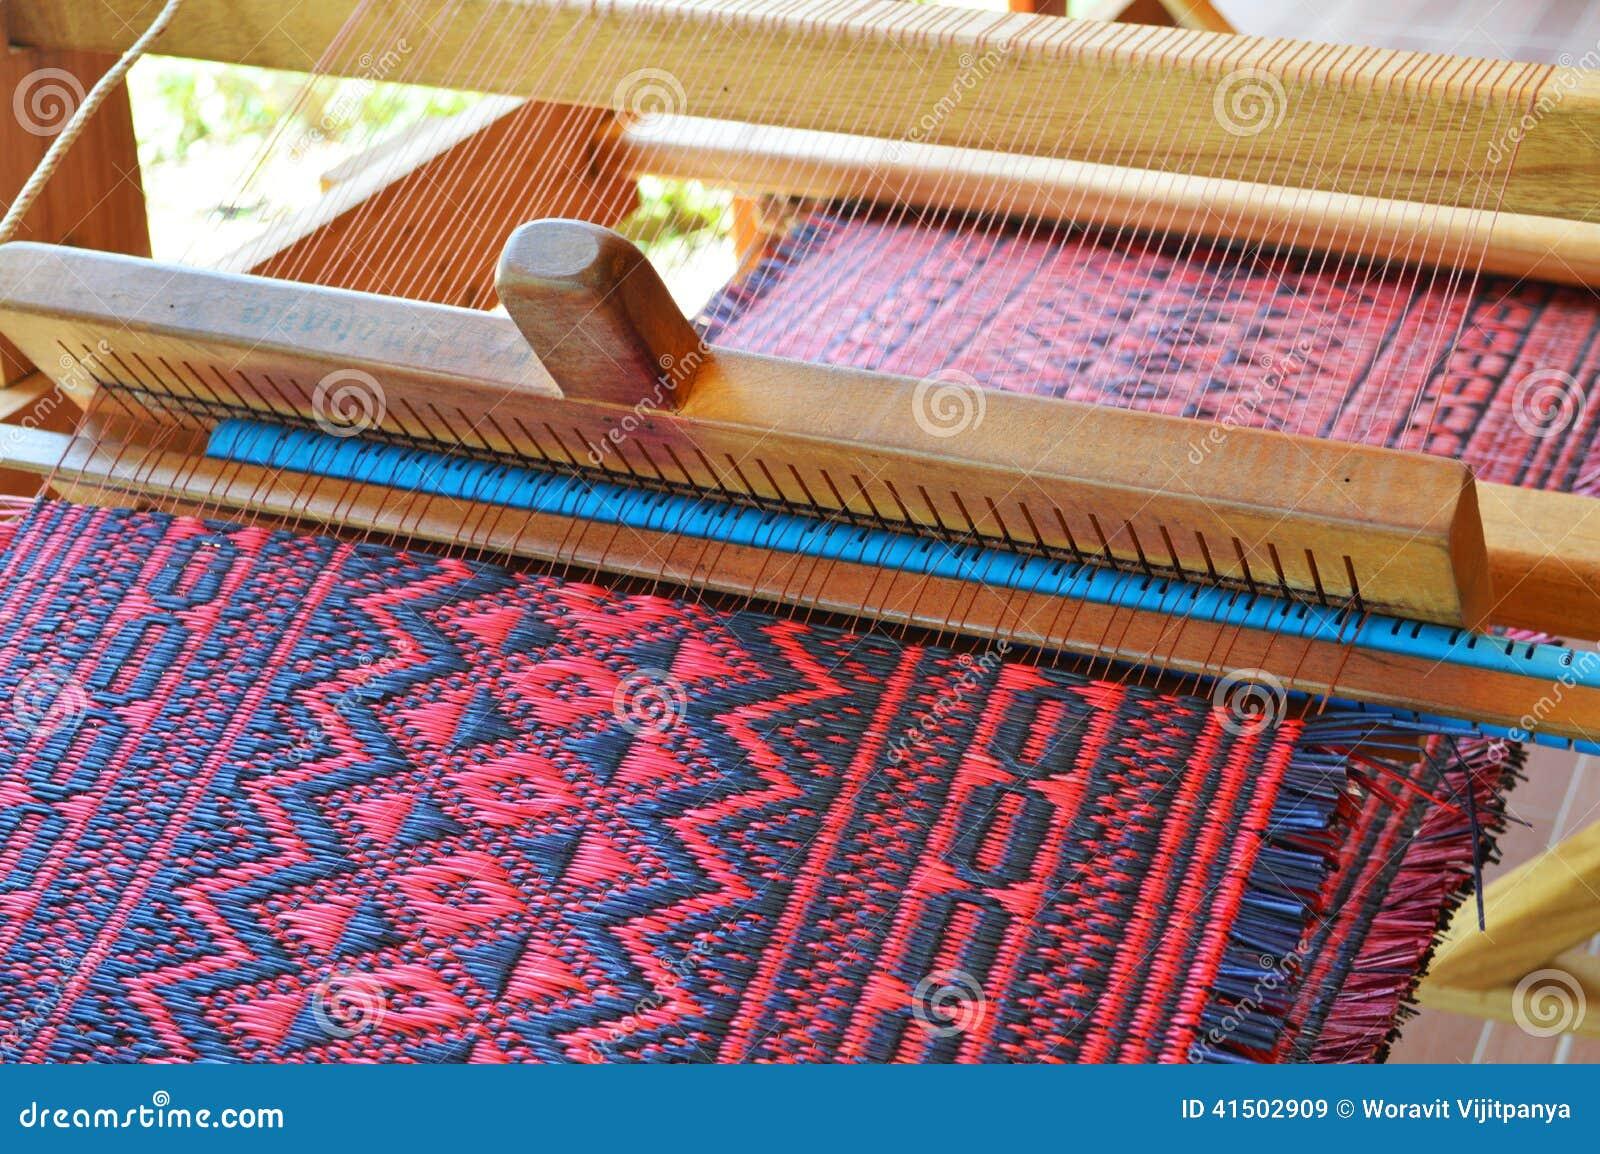 m tier tisser de tissage traditionnel photo stock image 41502909. Black Bedroom Furniture Sets. Home Design Ideas